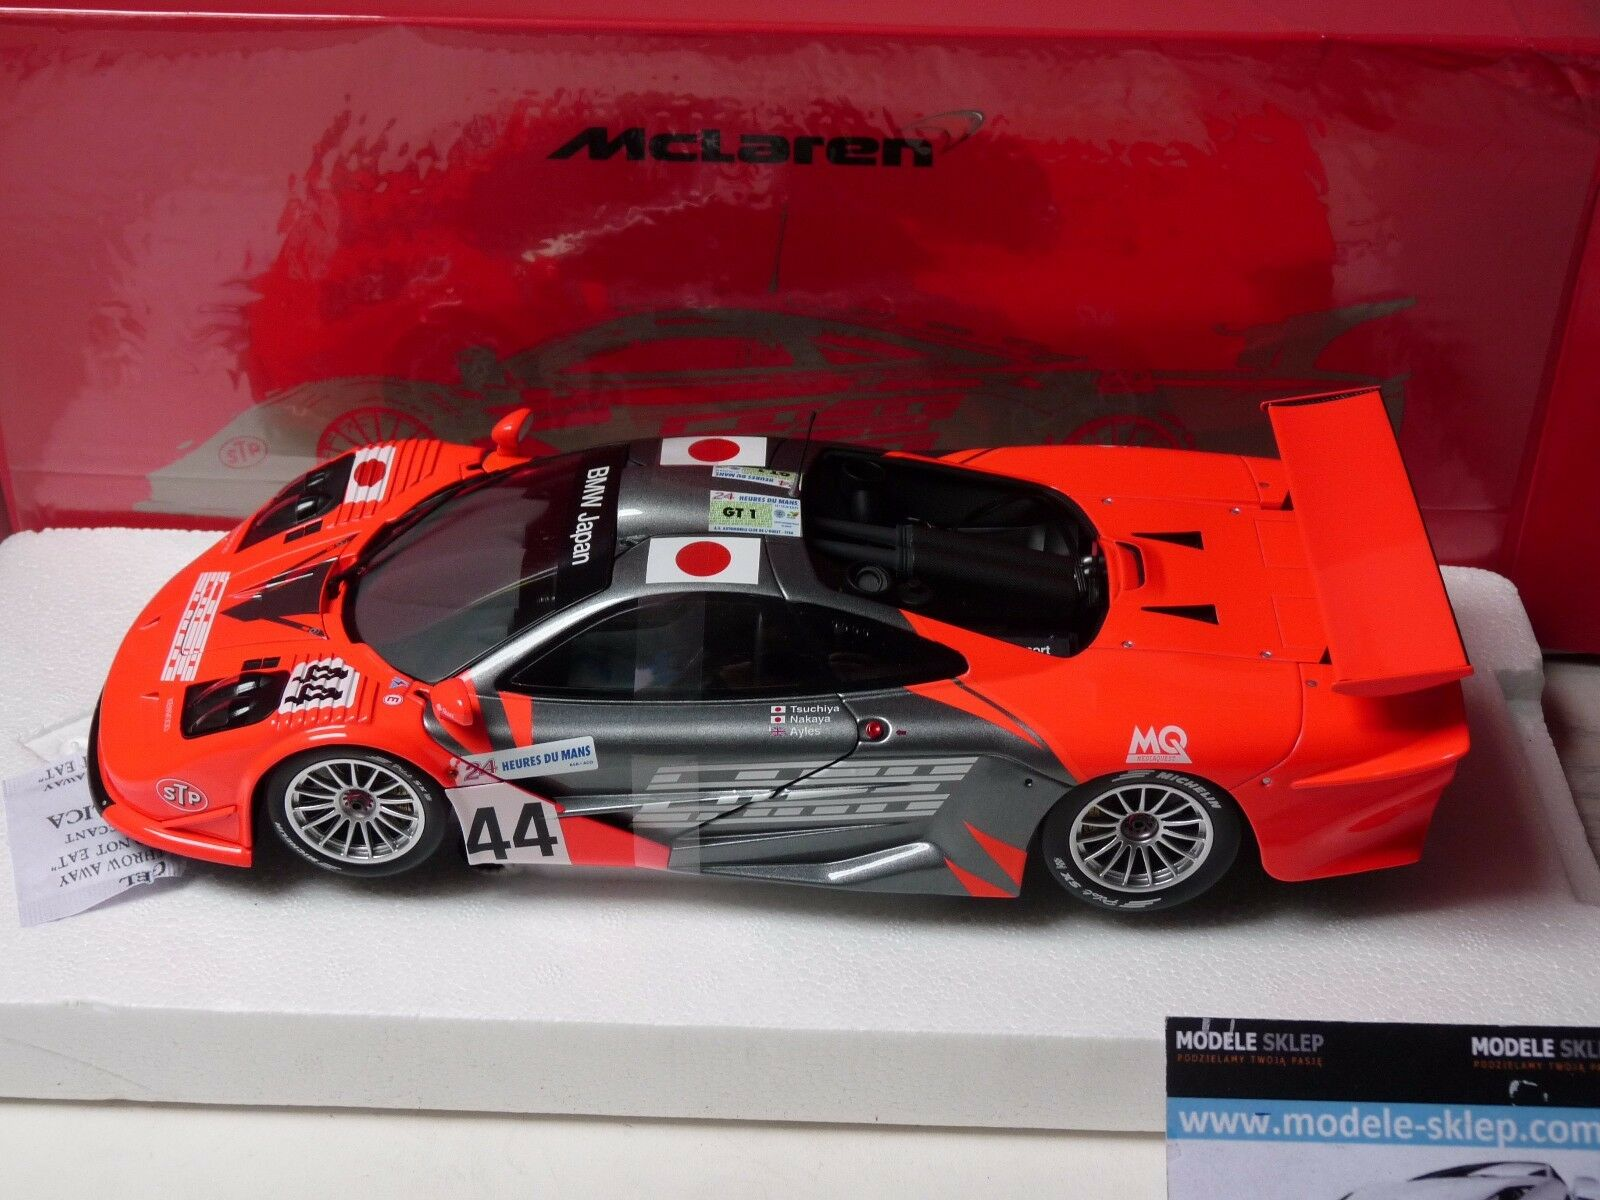 1997 MCLAREN F1 GTR a LARK squadra BMW Giappone 24H LE uomoS   44 1 18 Minichamps